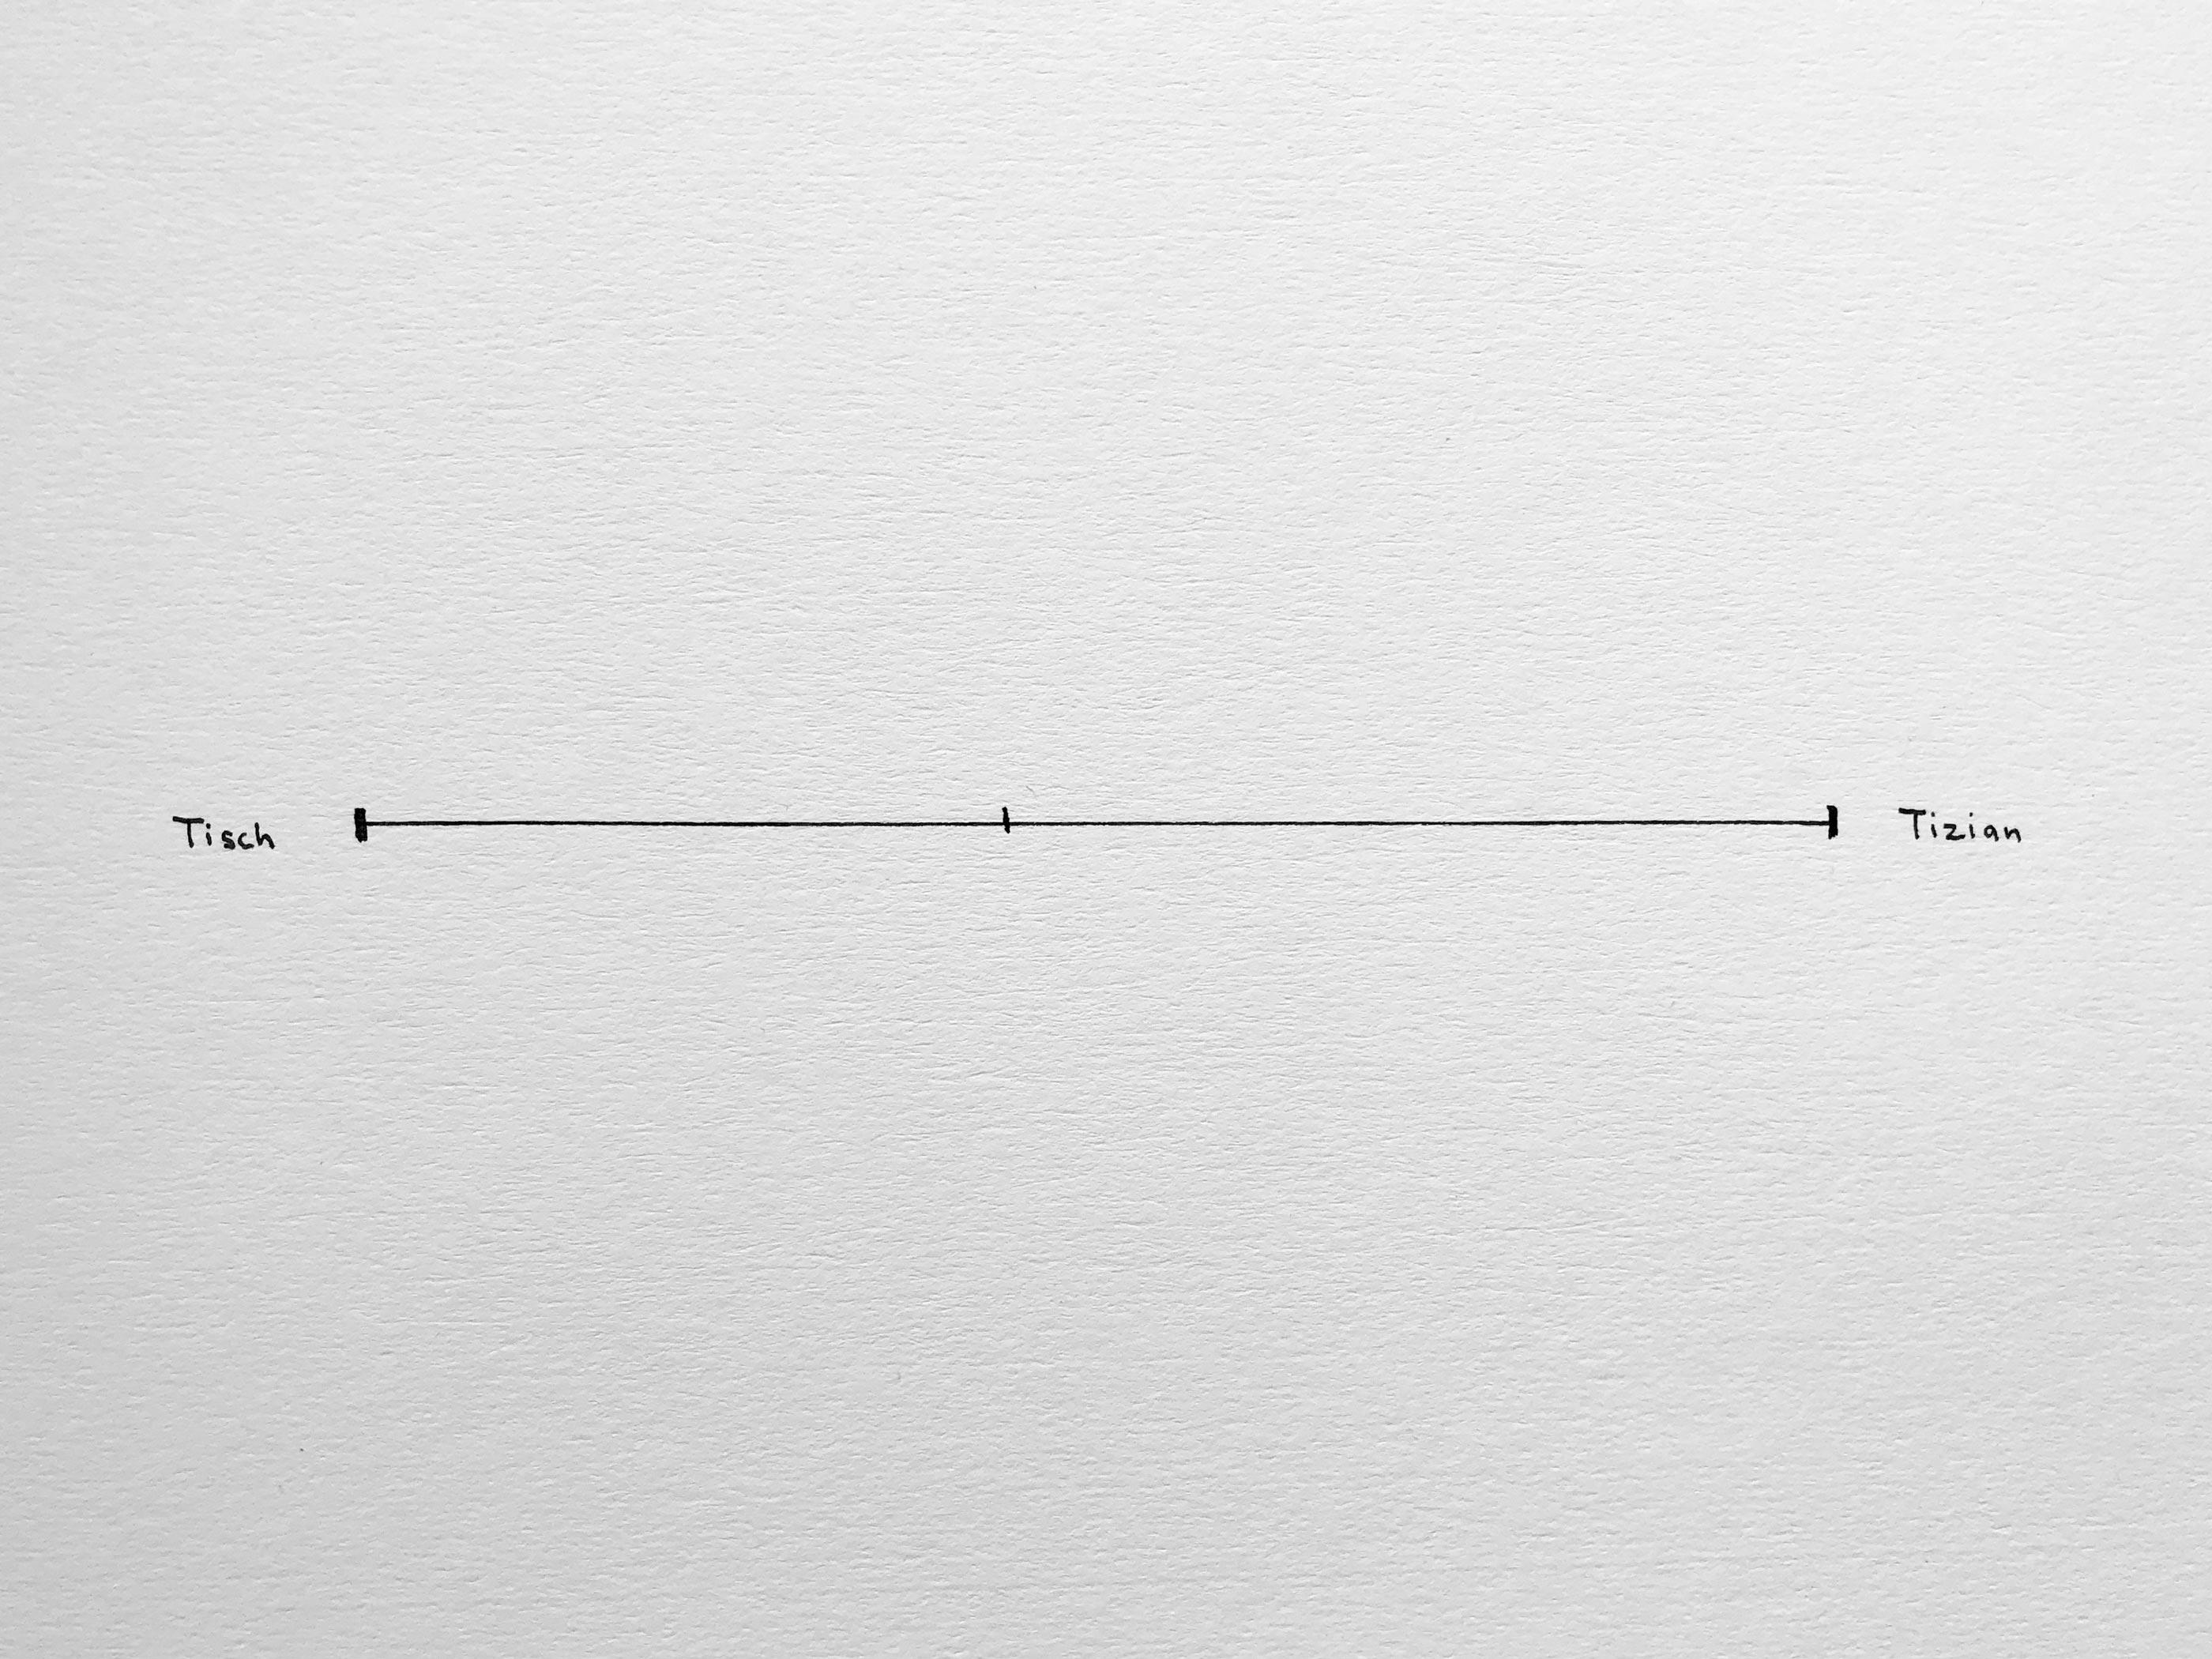 Odd Parameters: Tisch-Tizian, Pen on Paper, 32x24cm, 2018